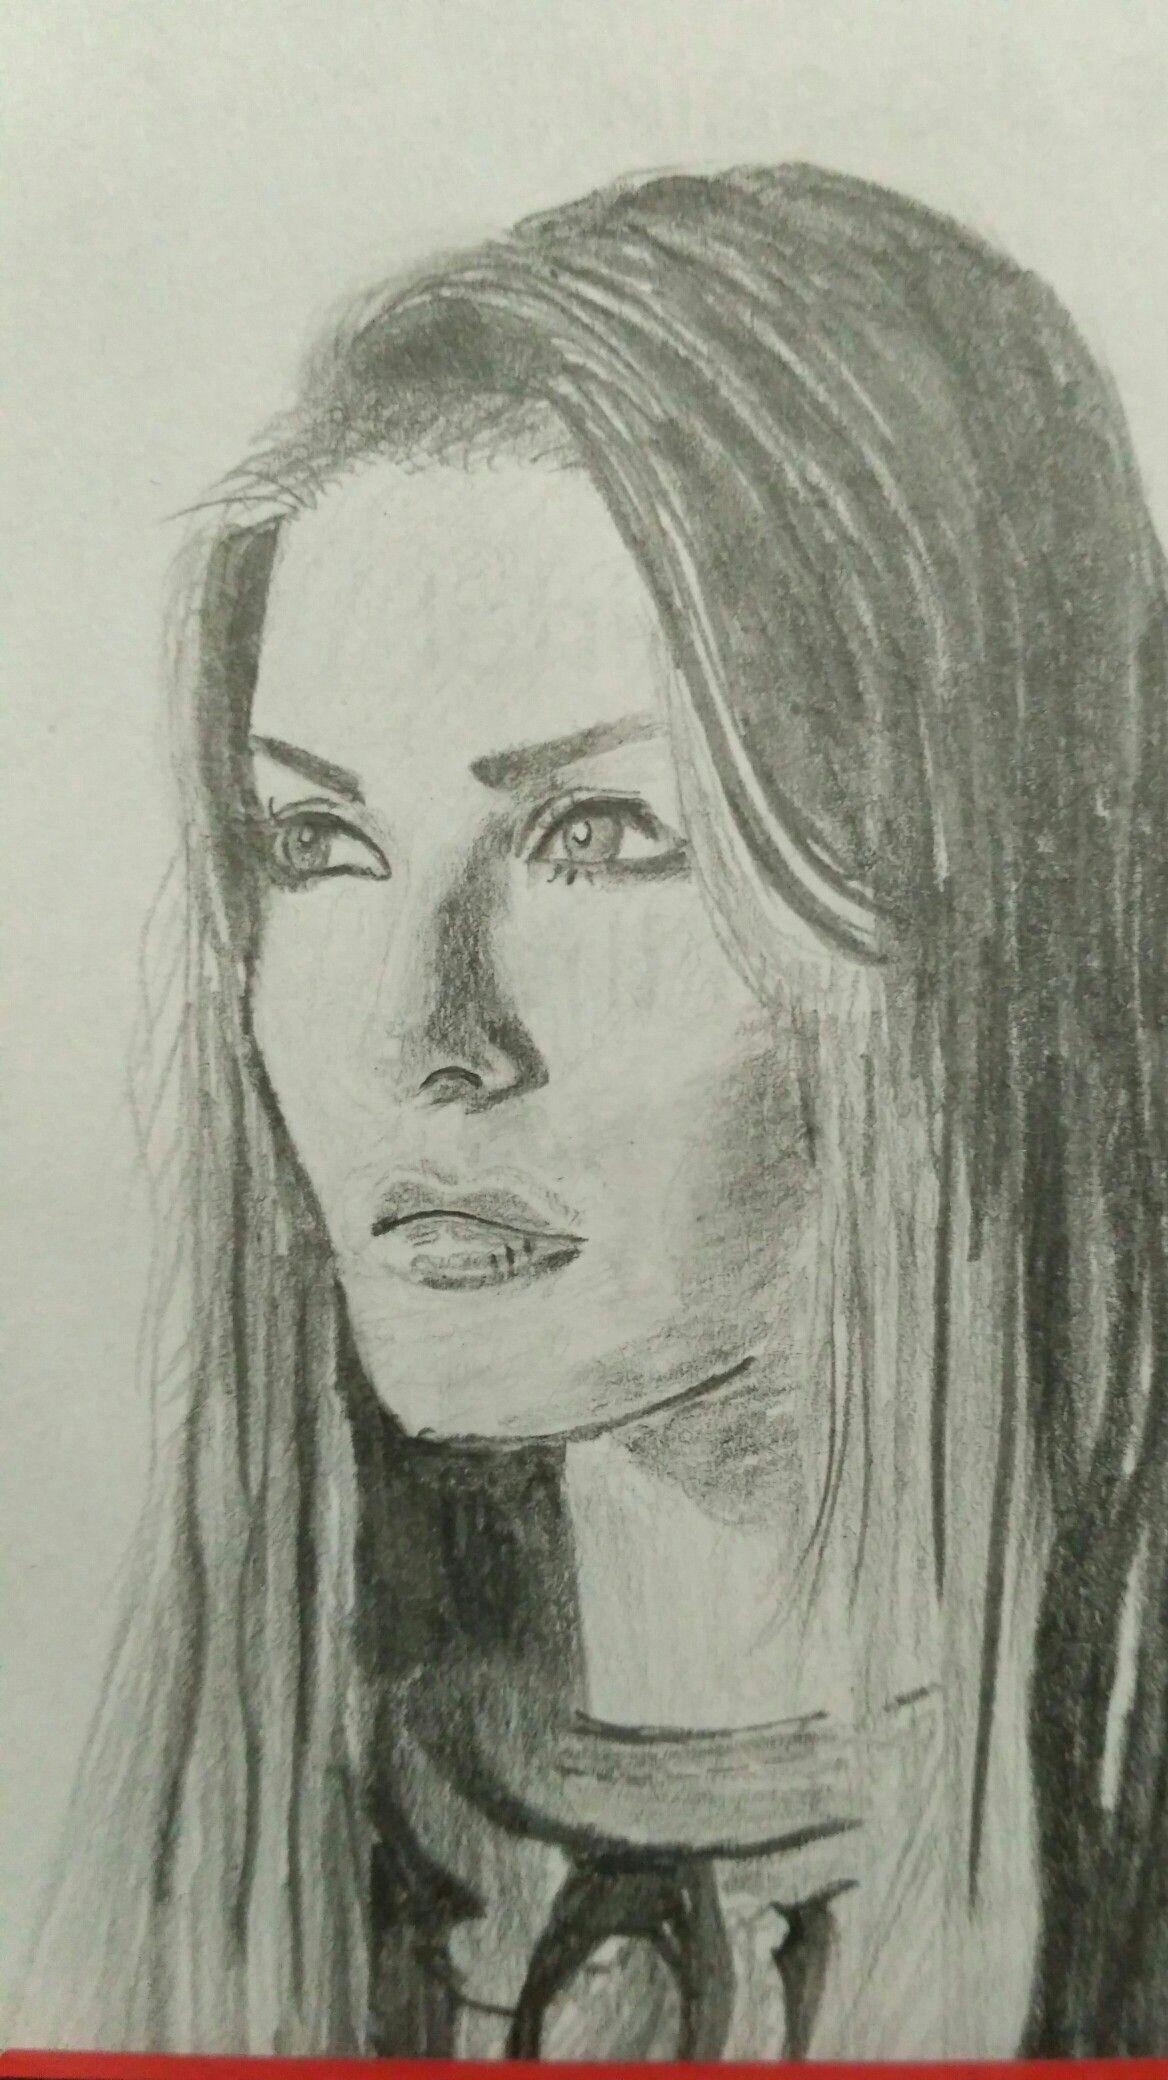 Sunny leone face sketch made through pencil by avinash kumar